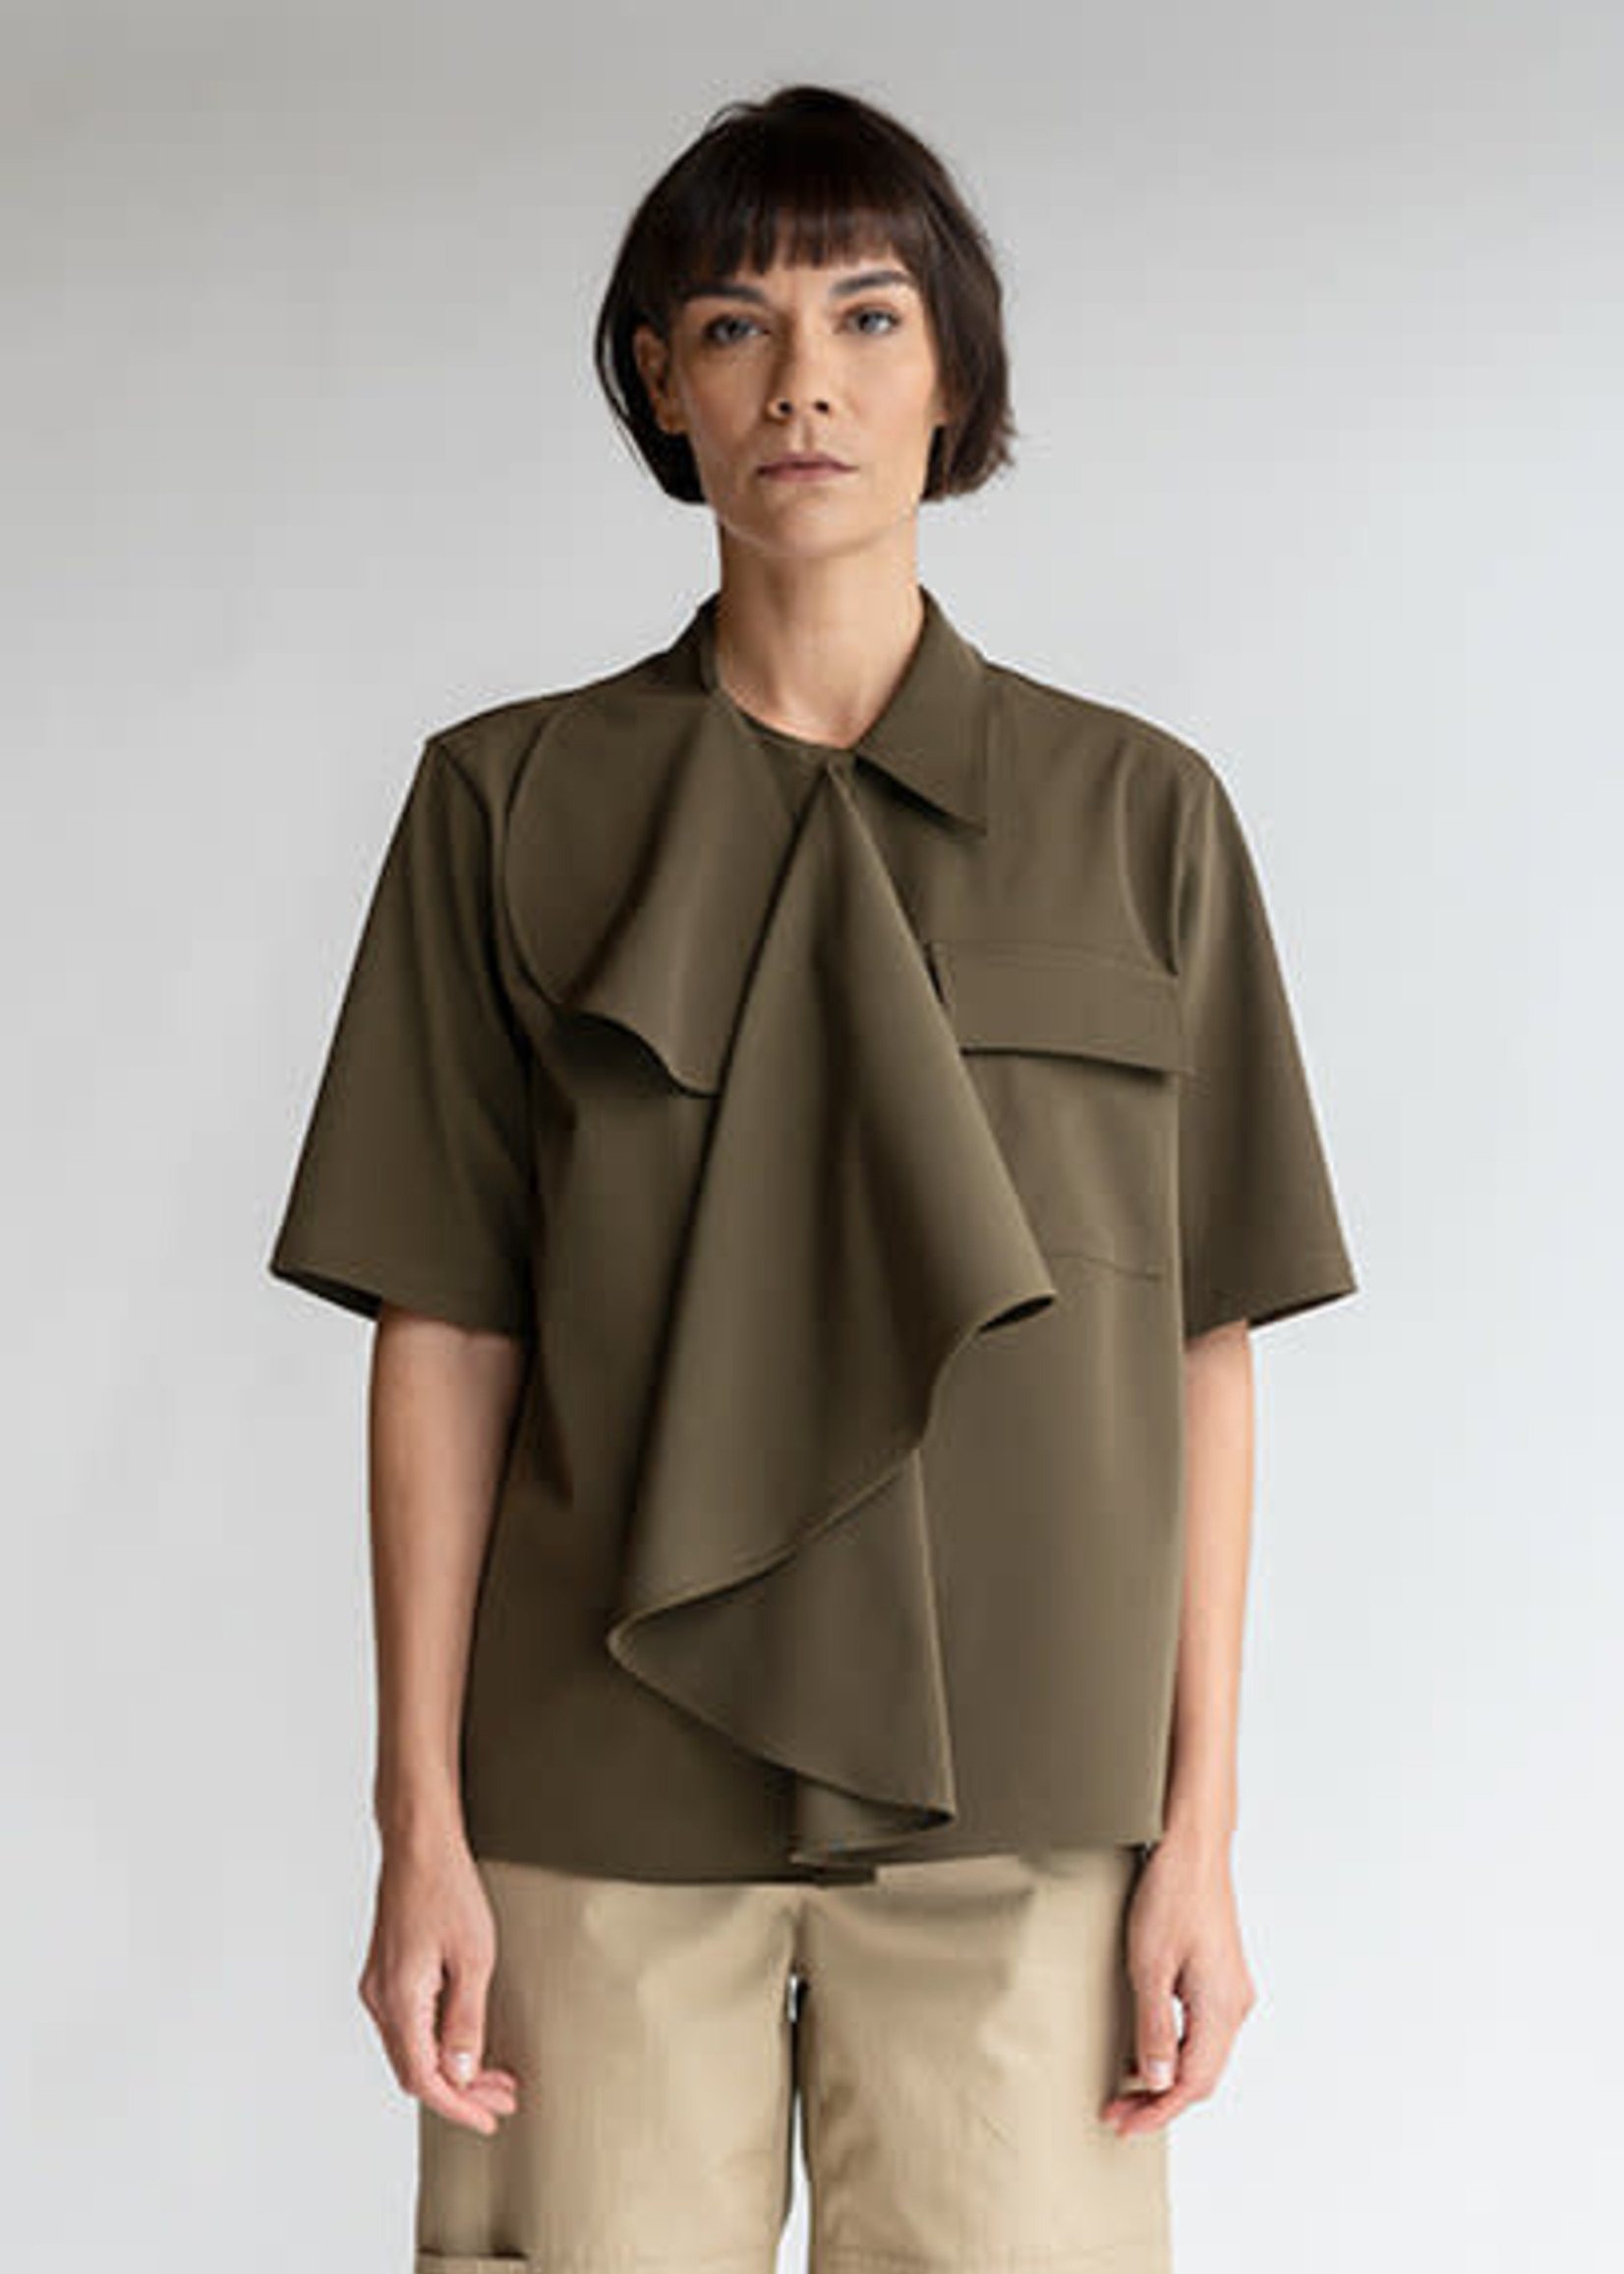 MM6 MAISON MARGIELA Multi-Wear Drape Shirt in Military Green